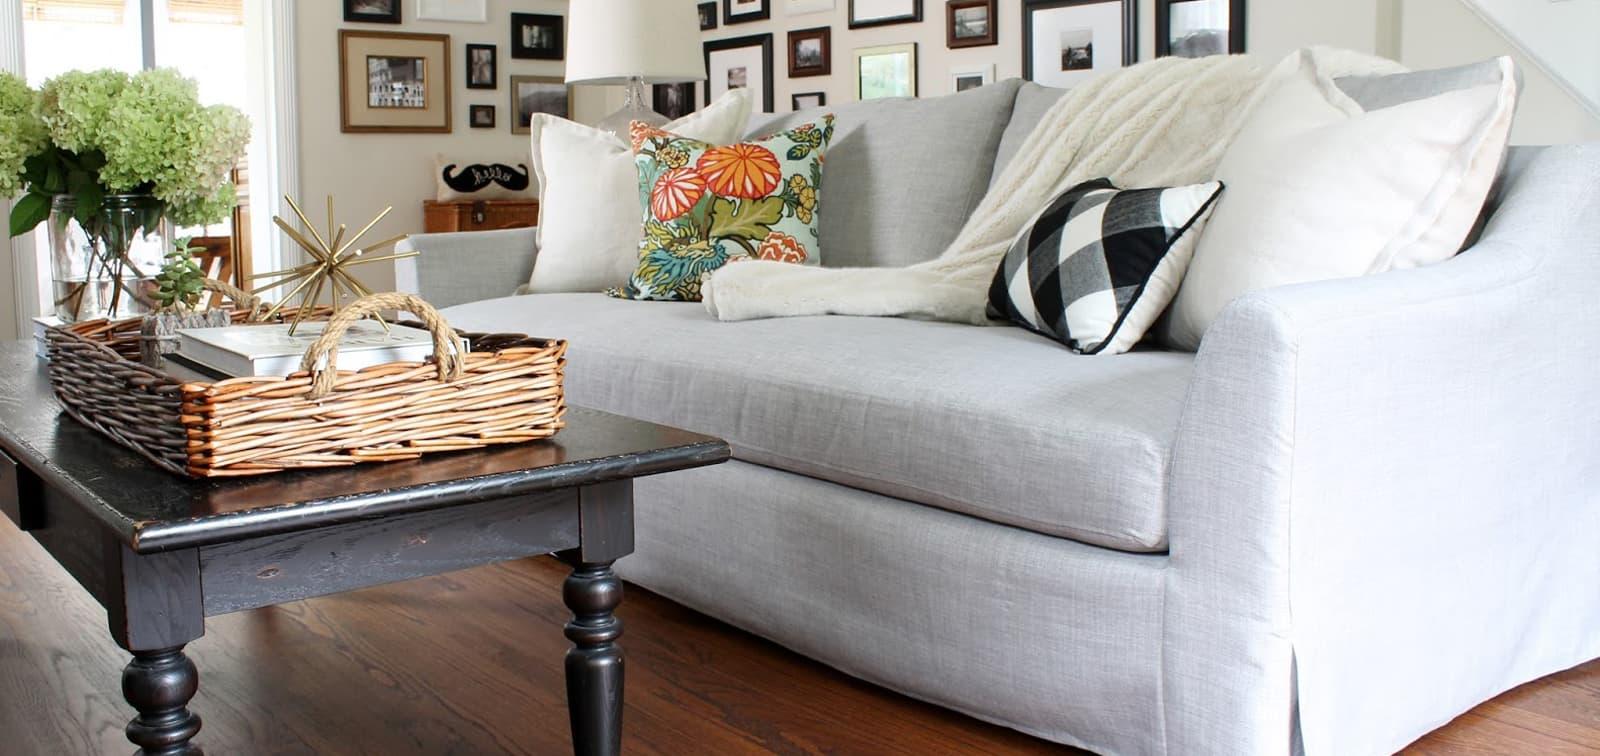 Hülsta Sofabezug Eckfalten